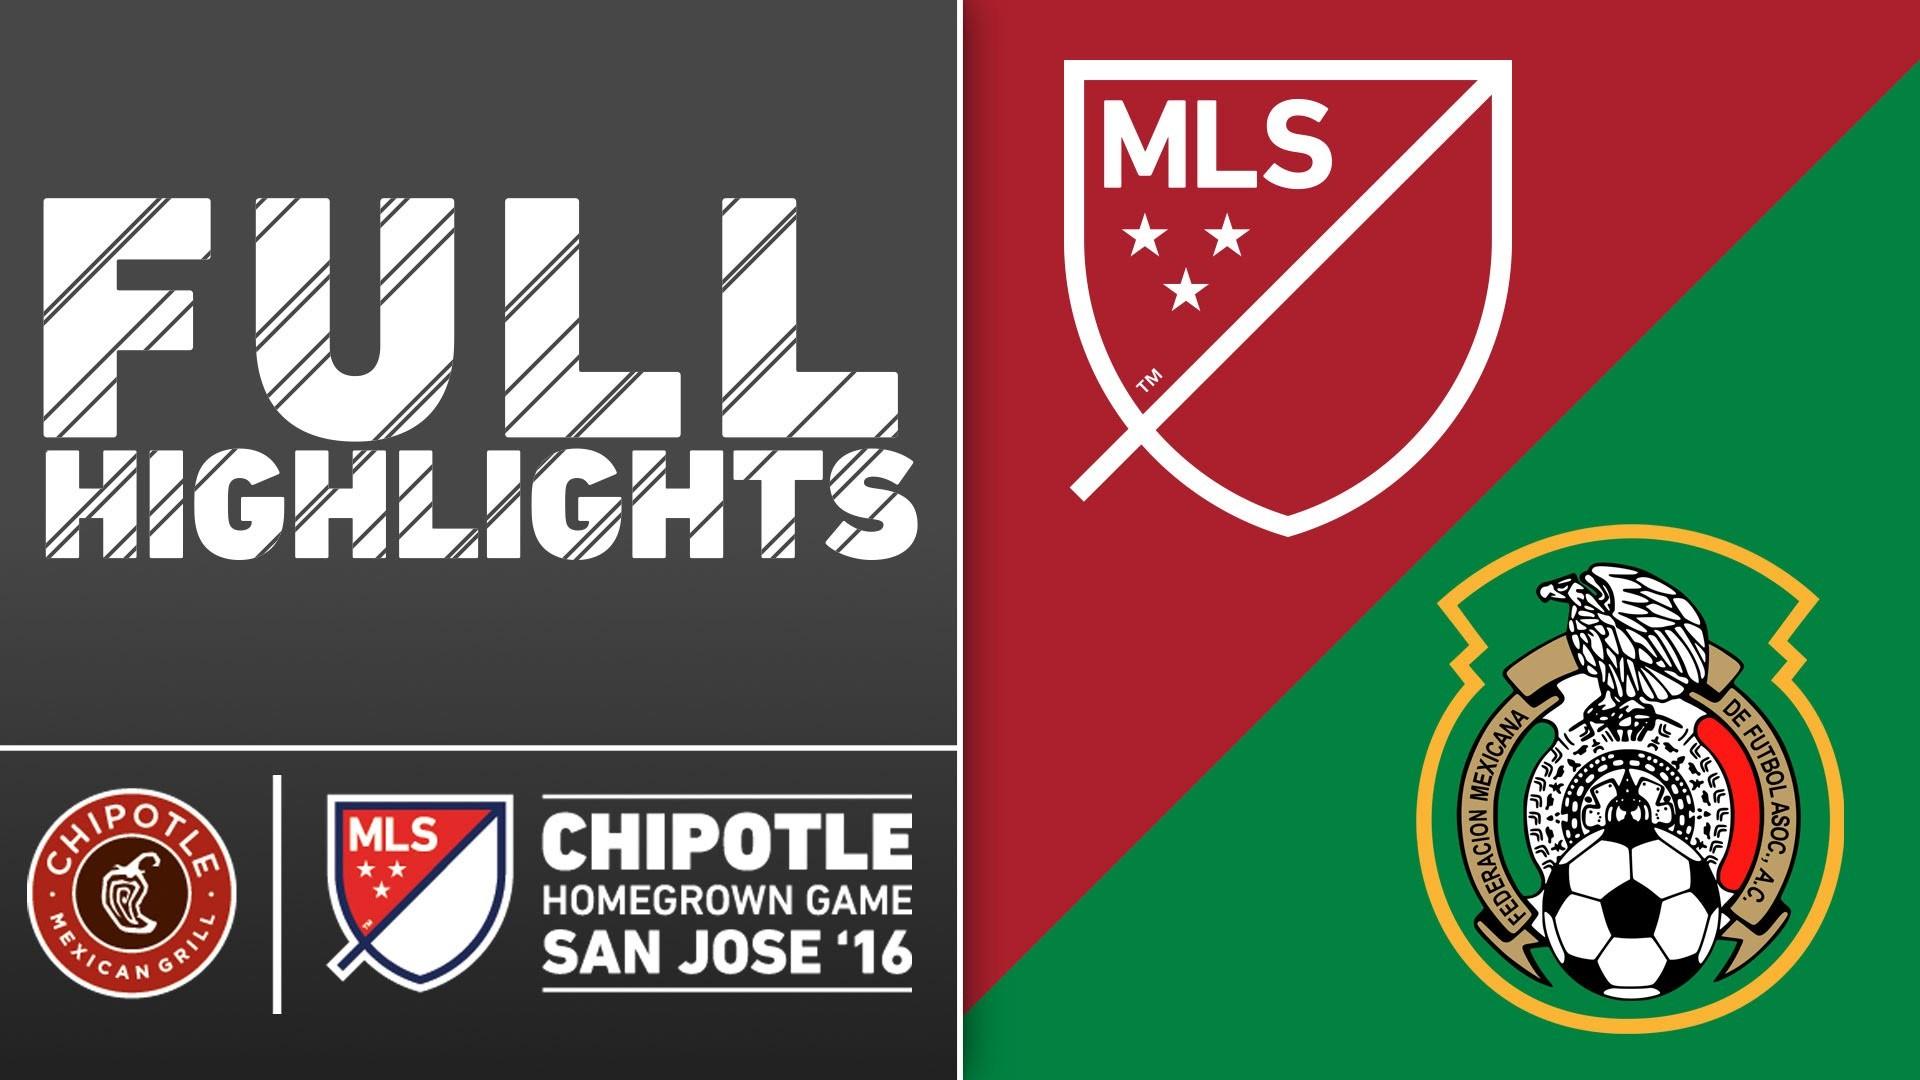 HIGHLIGHTS | MLS Homegrown Team 0-2 Mexico Under-20 Men's National Team